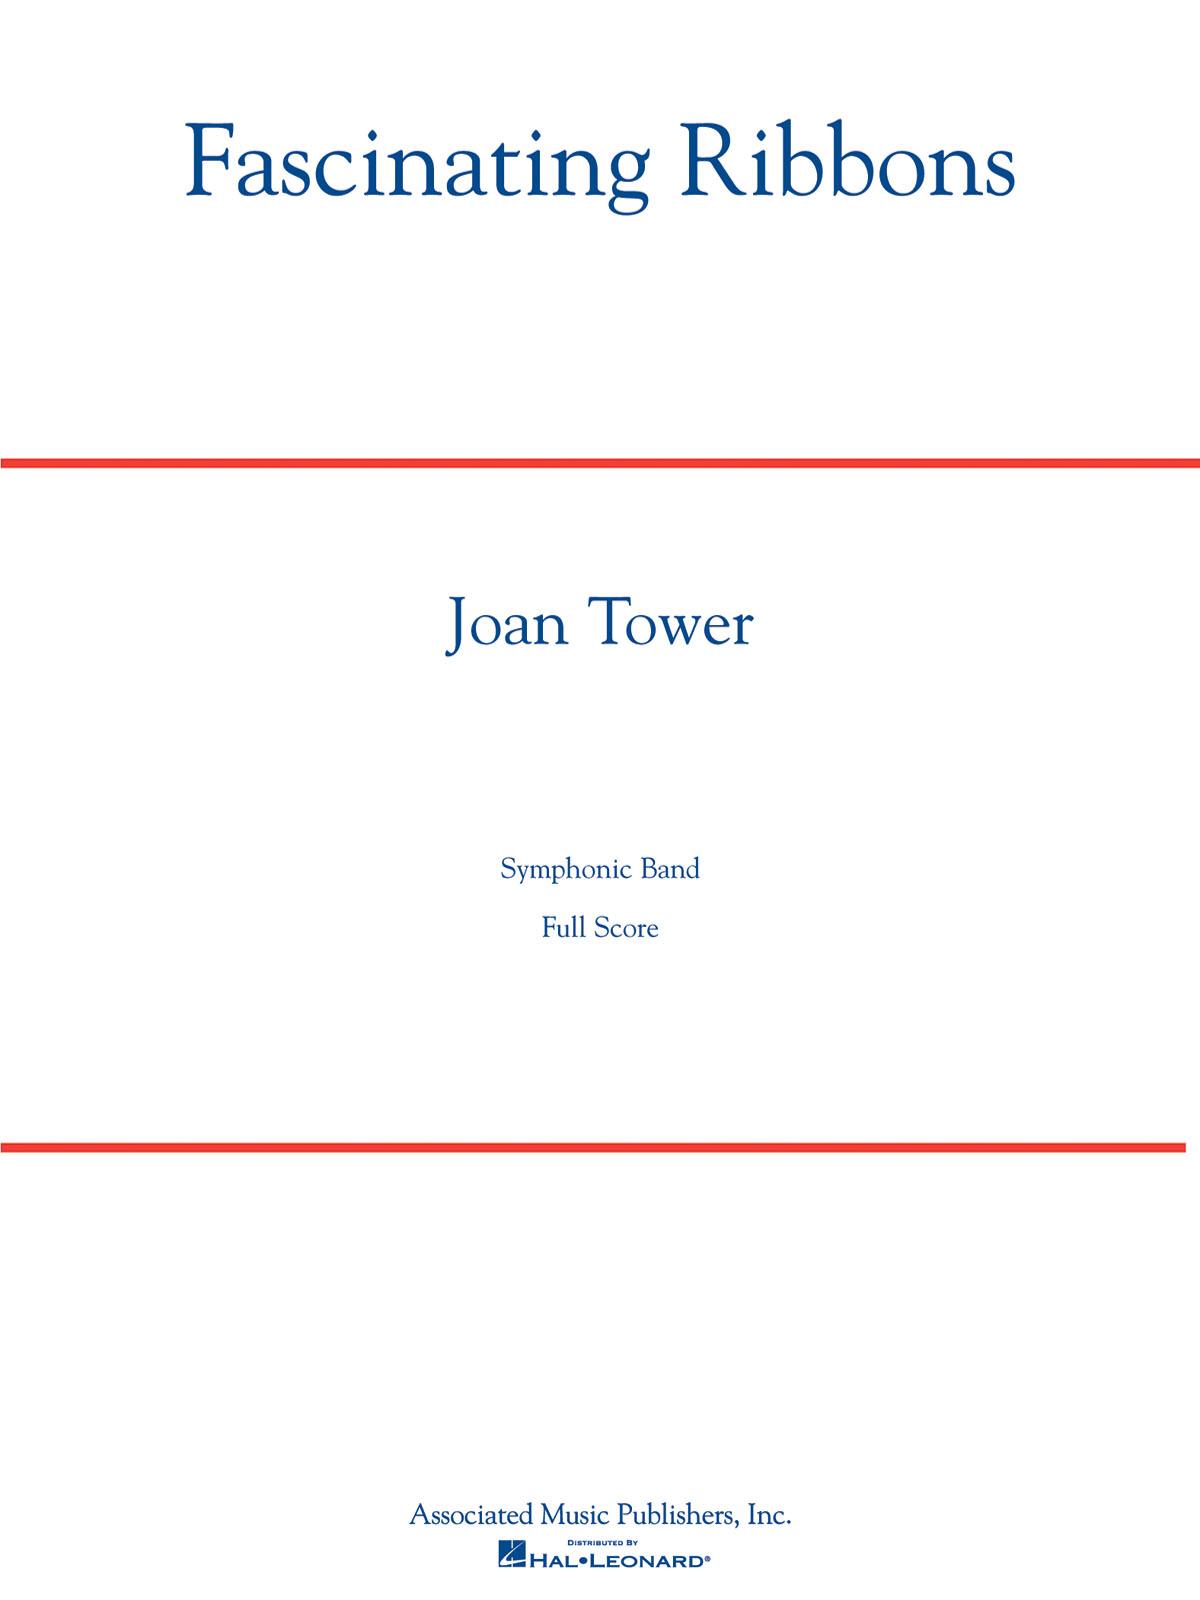 Joan Tower: Fascinating Ribbons: Concert Band: Score